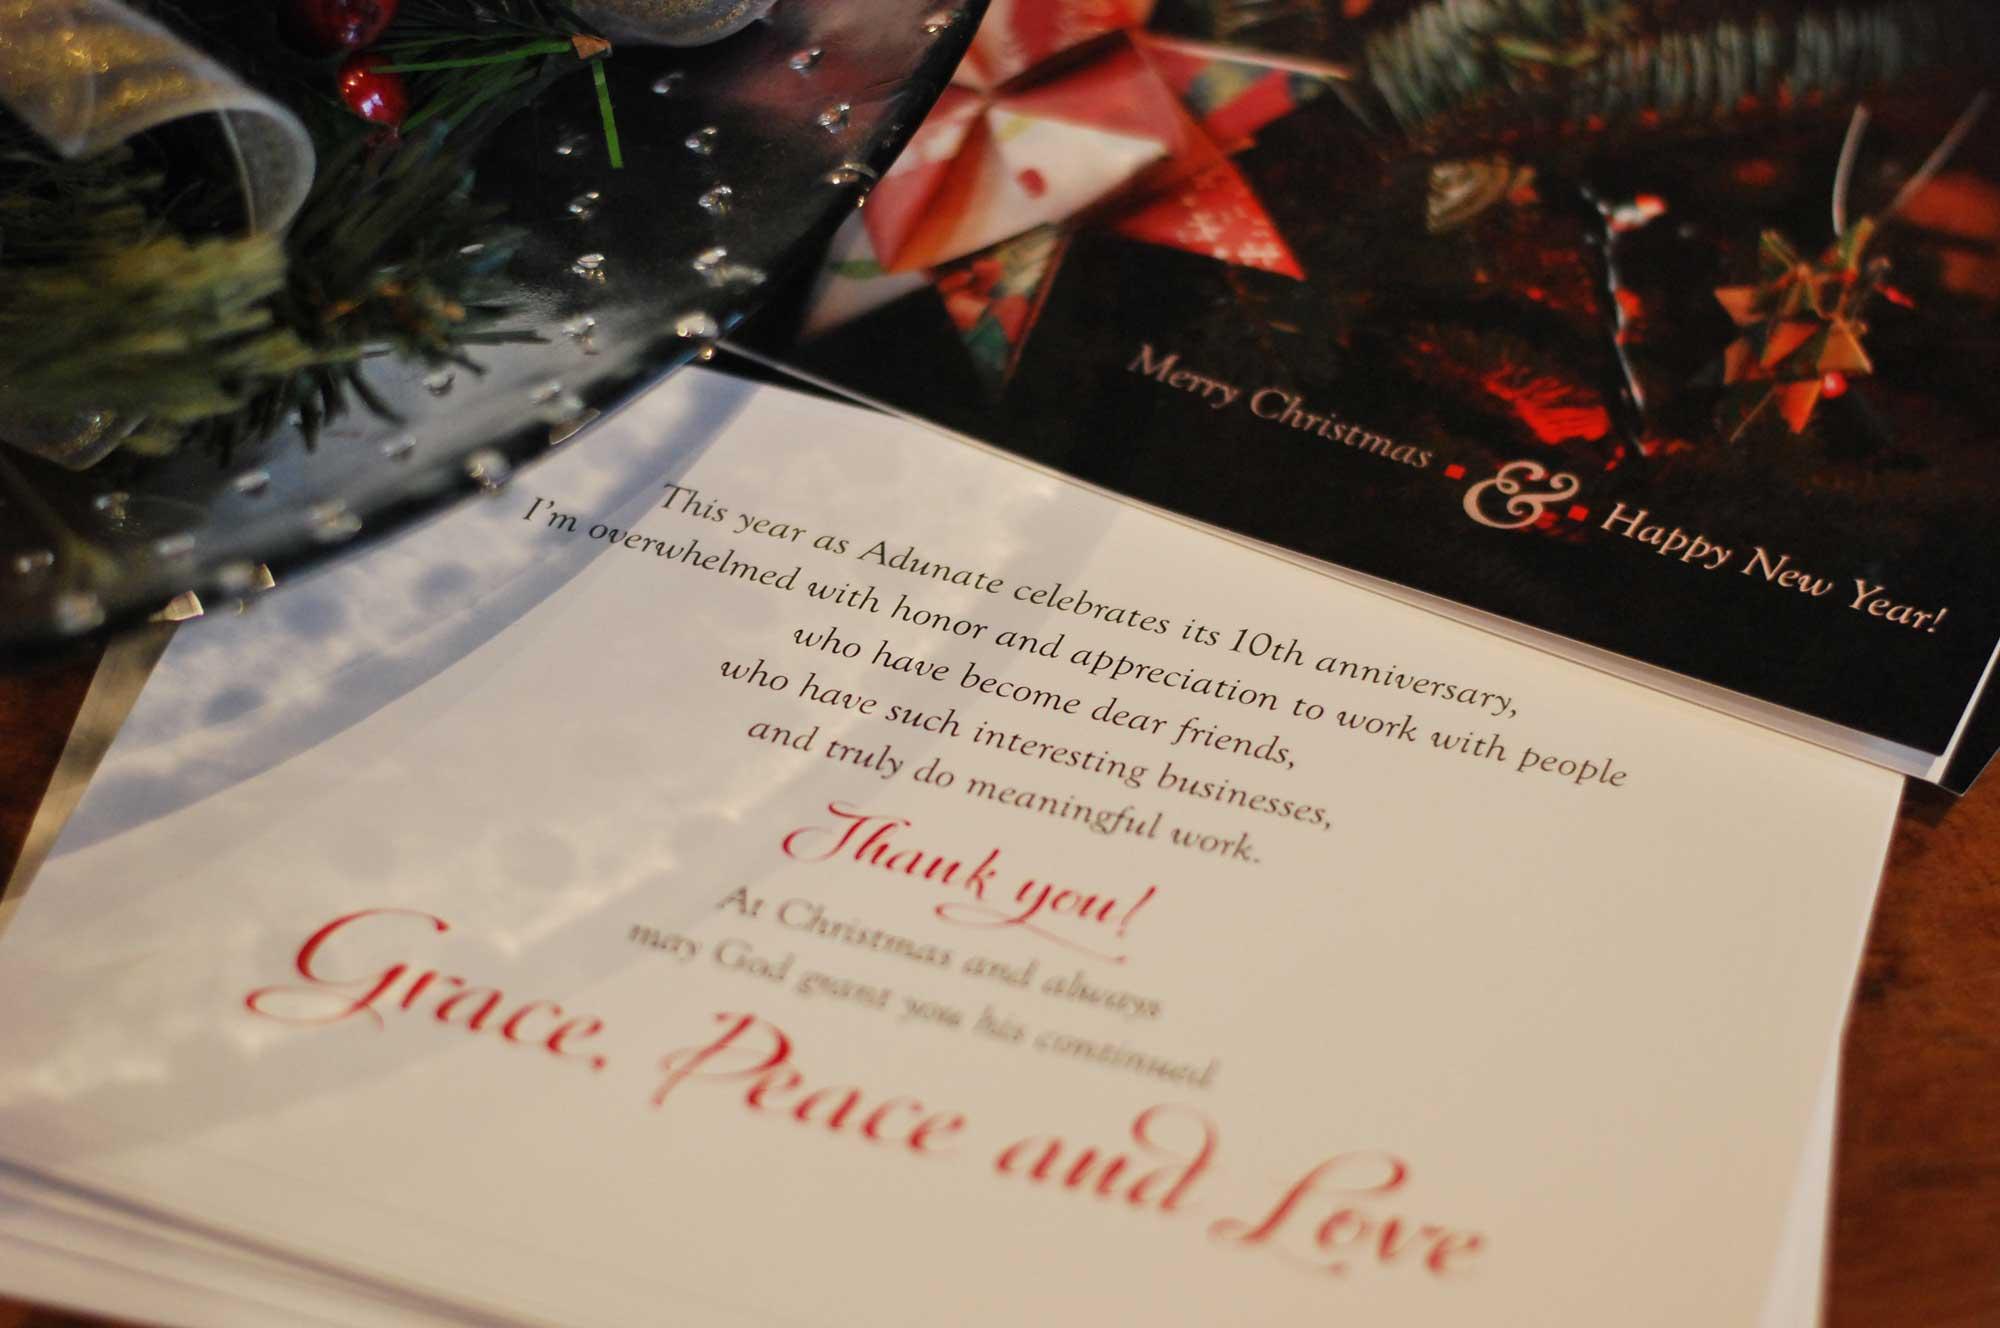 Christmas card 2015 by Adunate